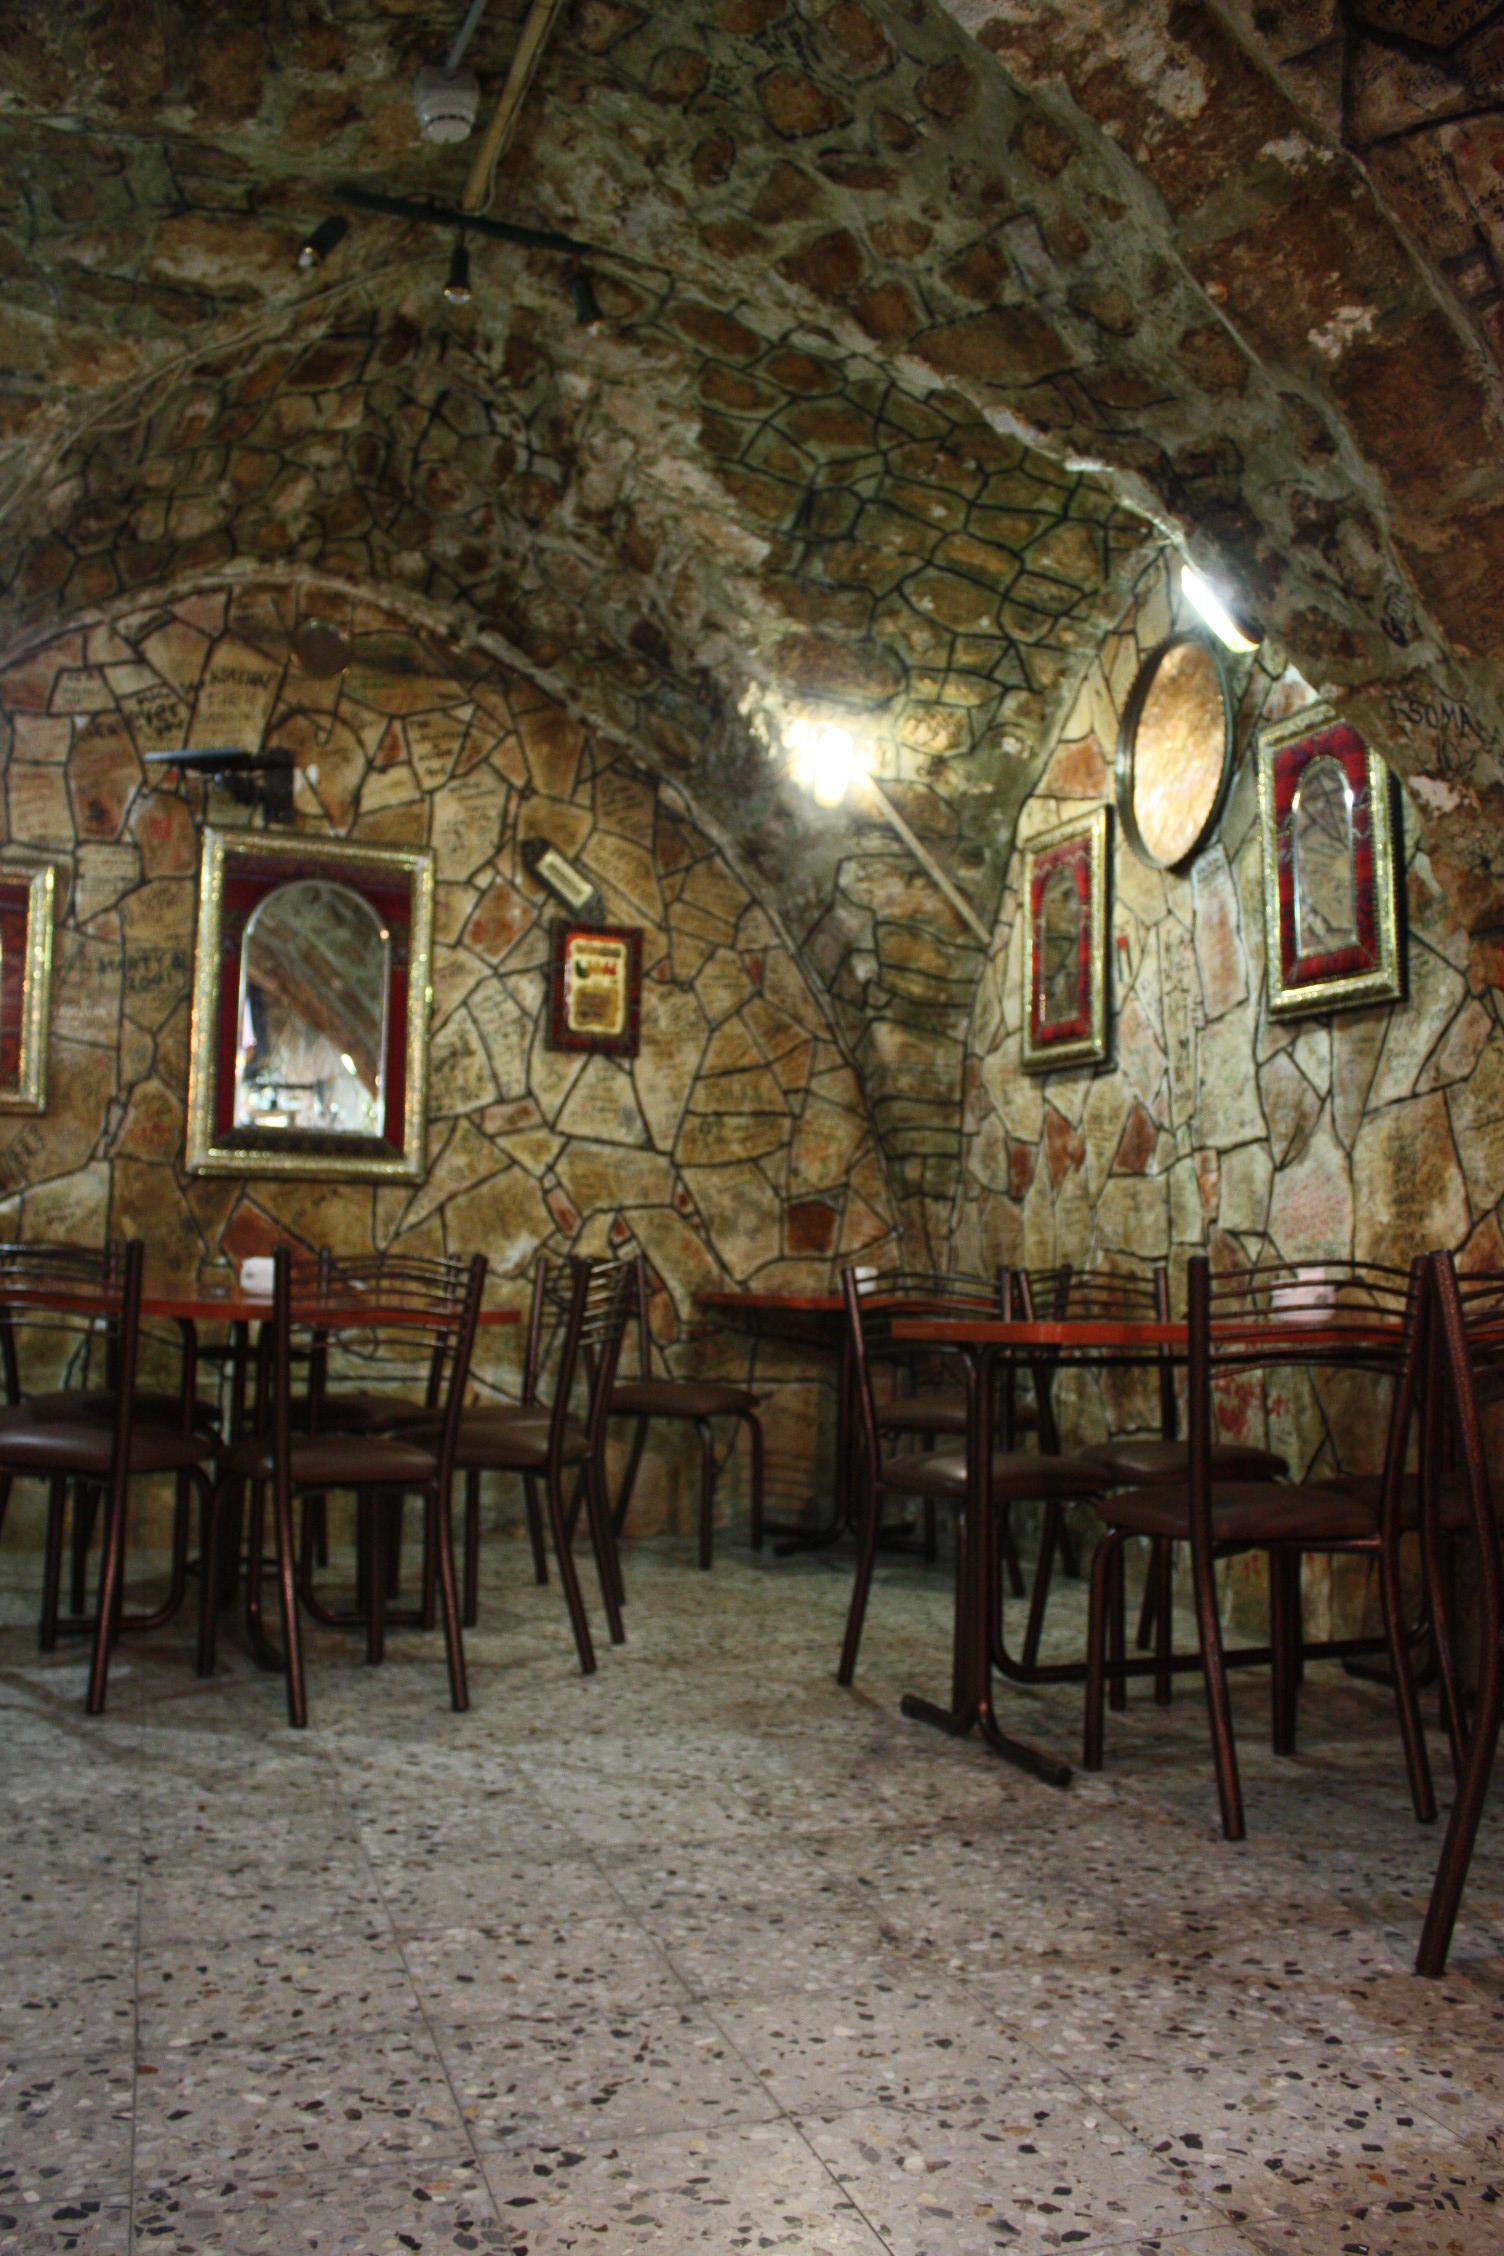 hebronhostel  Hebron Hostel  in the heart of the Old